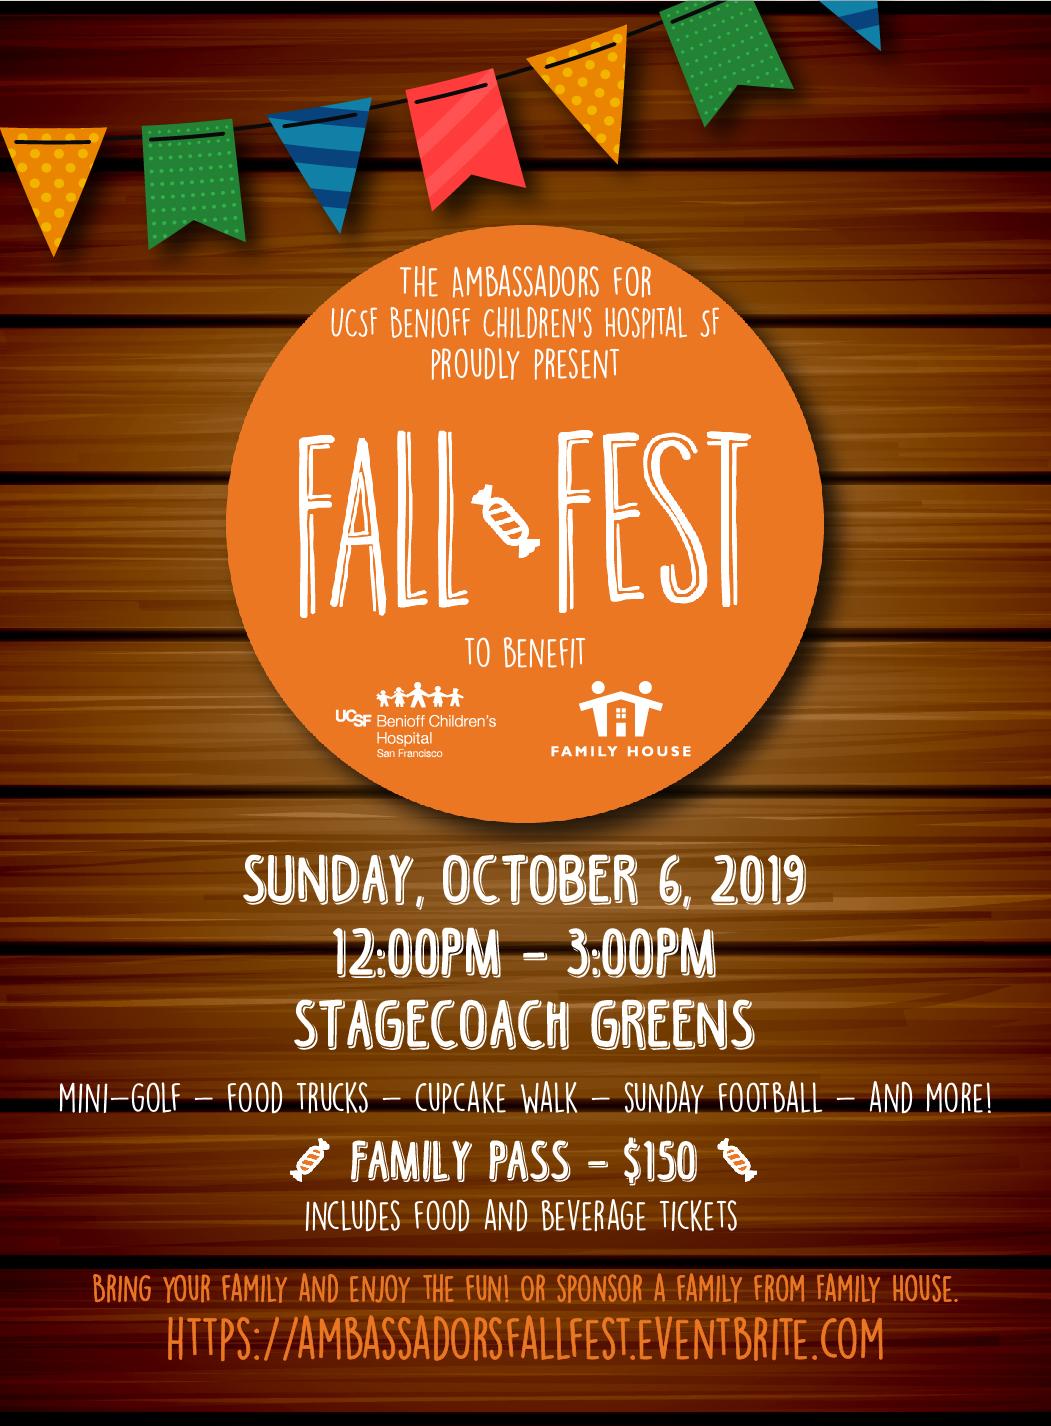 Fall Fest Tickets, Sun, Oct 6, 2019 at 12:00 PM   Eventbrite